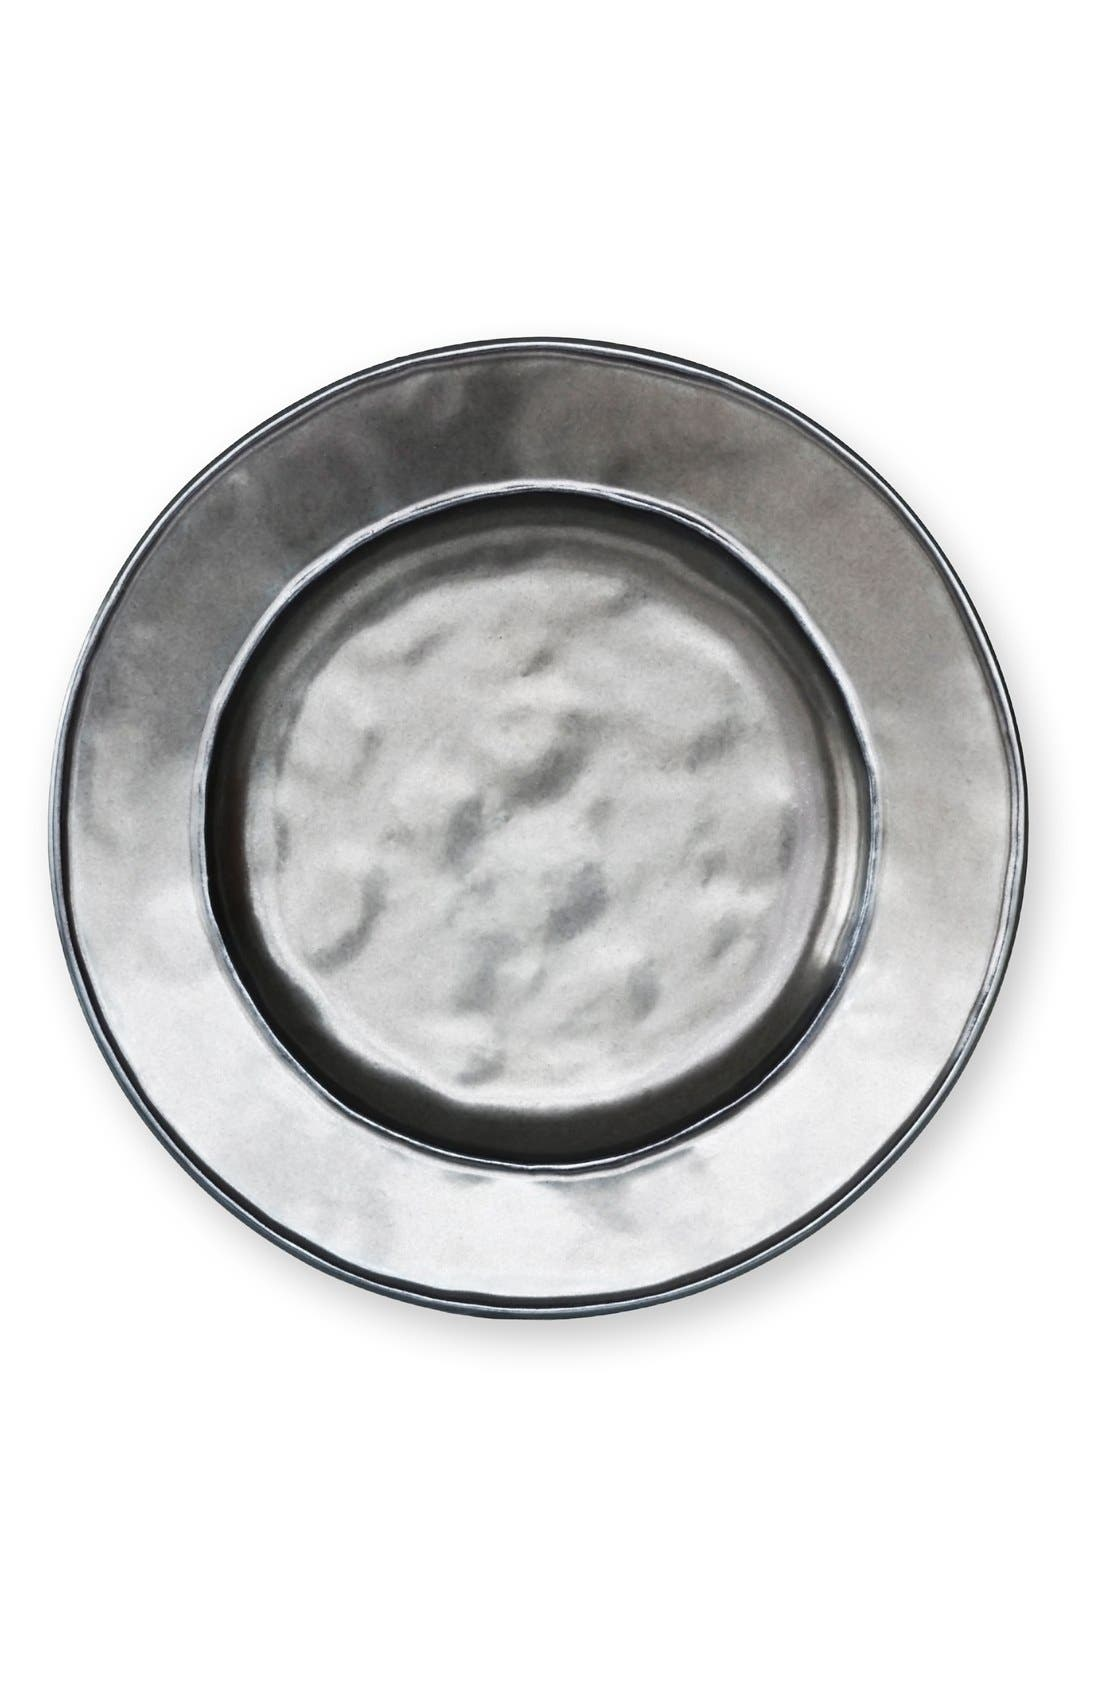 Juliska 'Pewter' Ceramic Side Plate